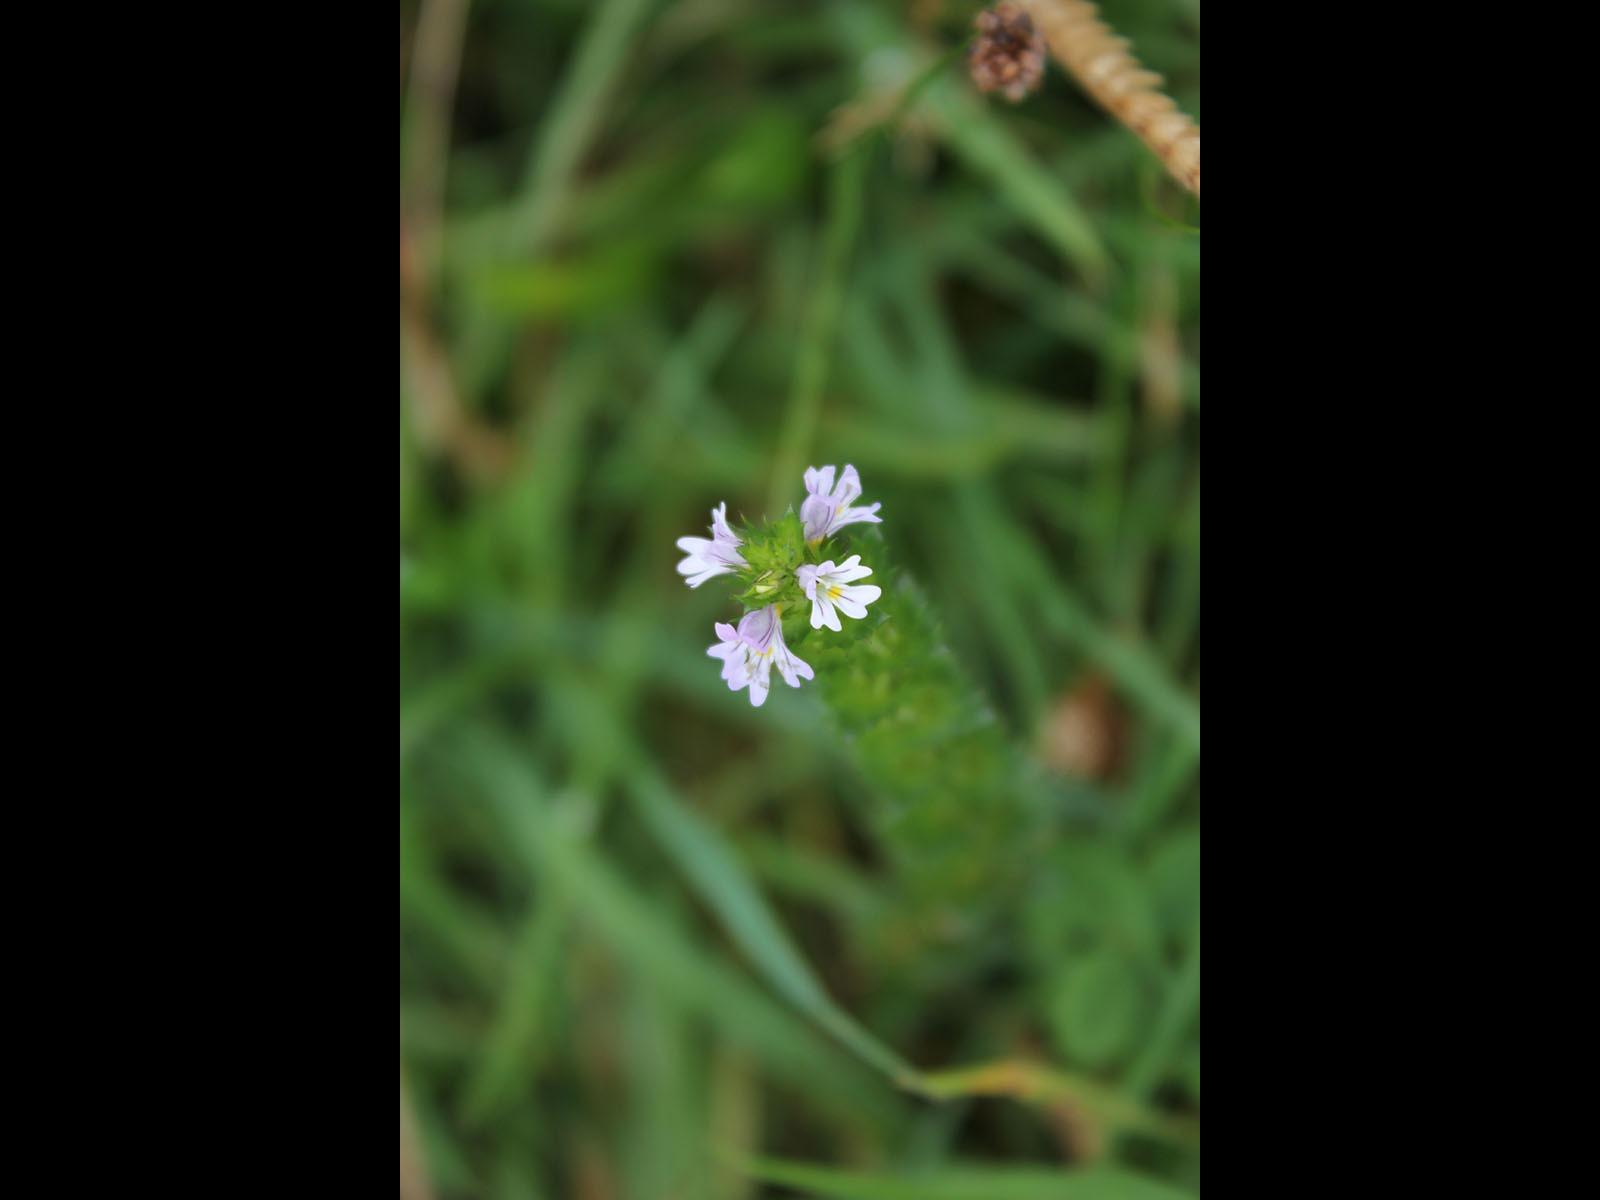 Flower by Stuart Alexander